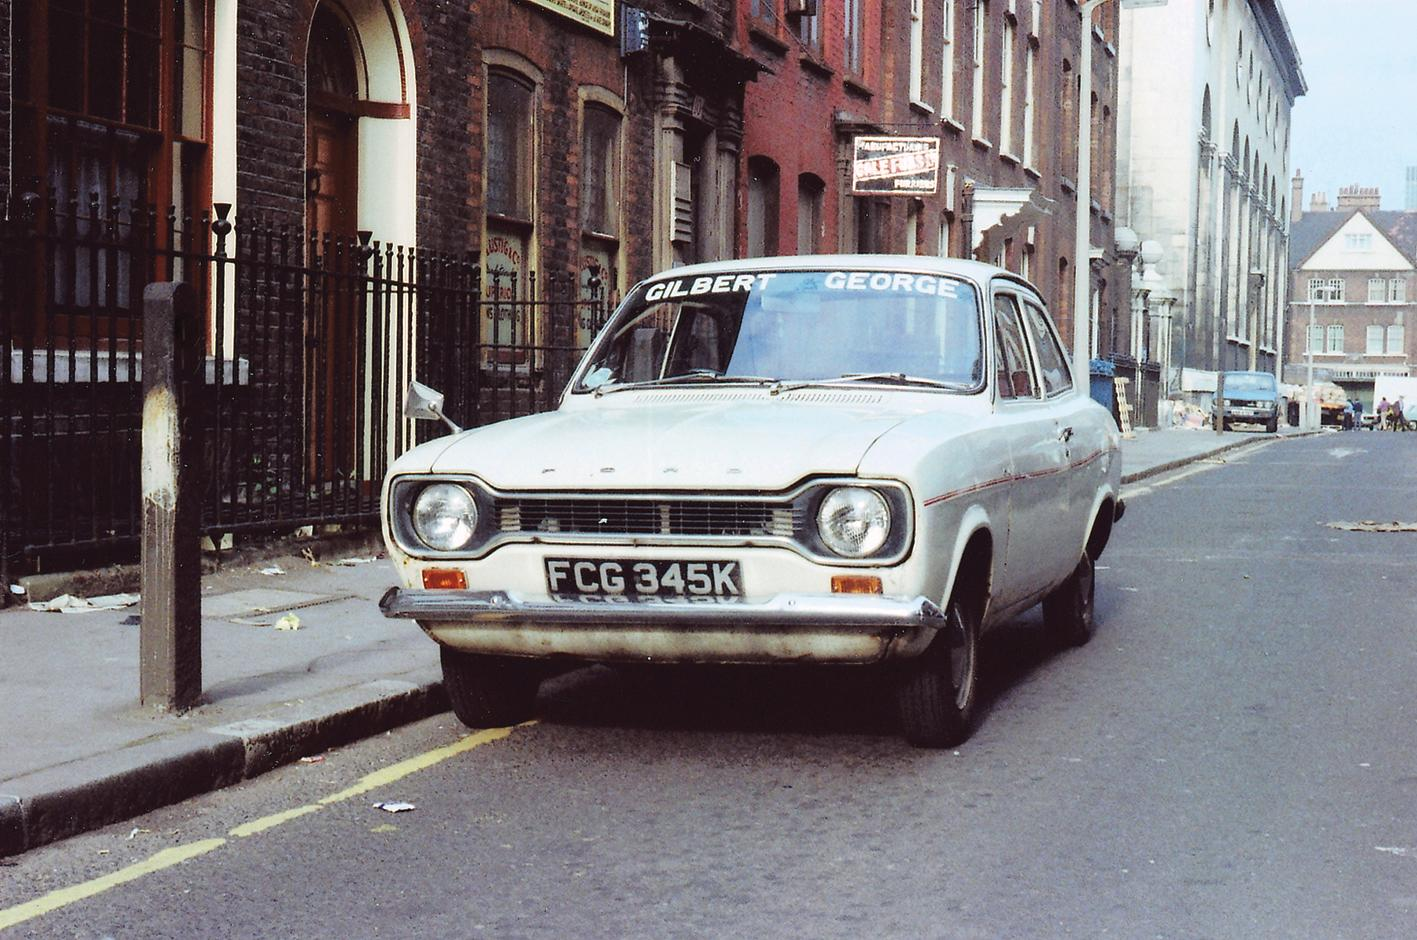 In Photos: London In 1981